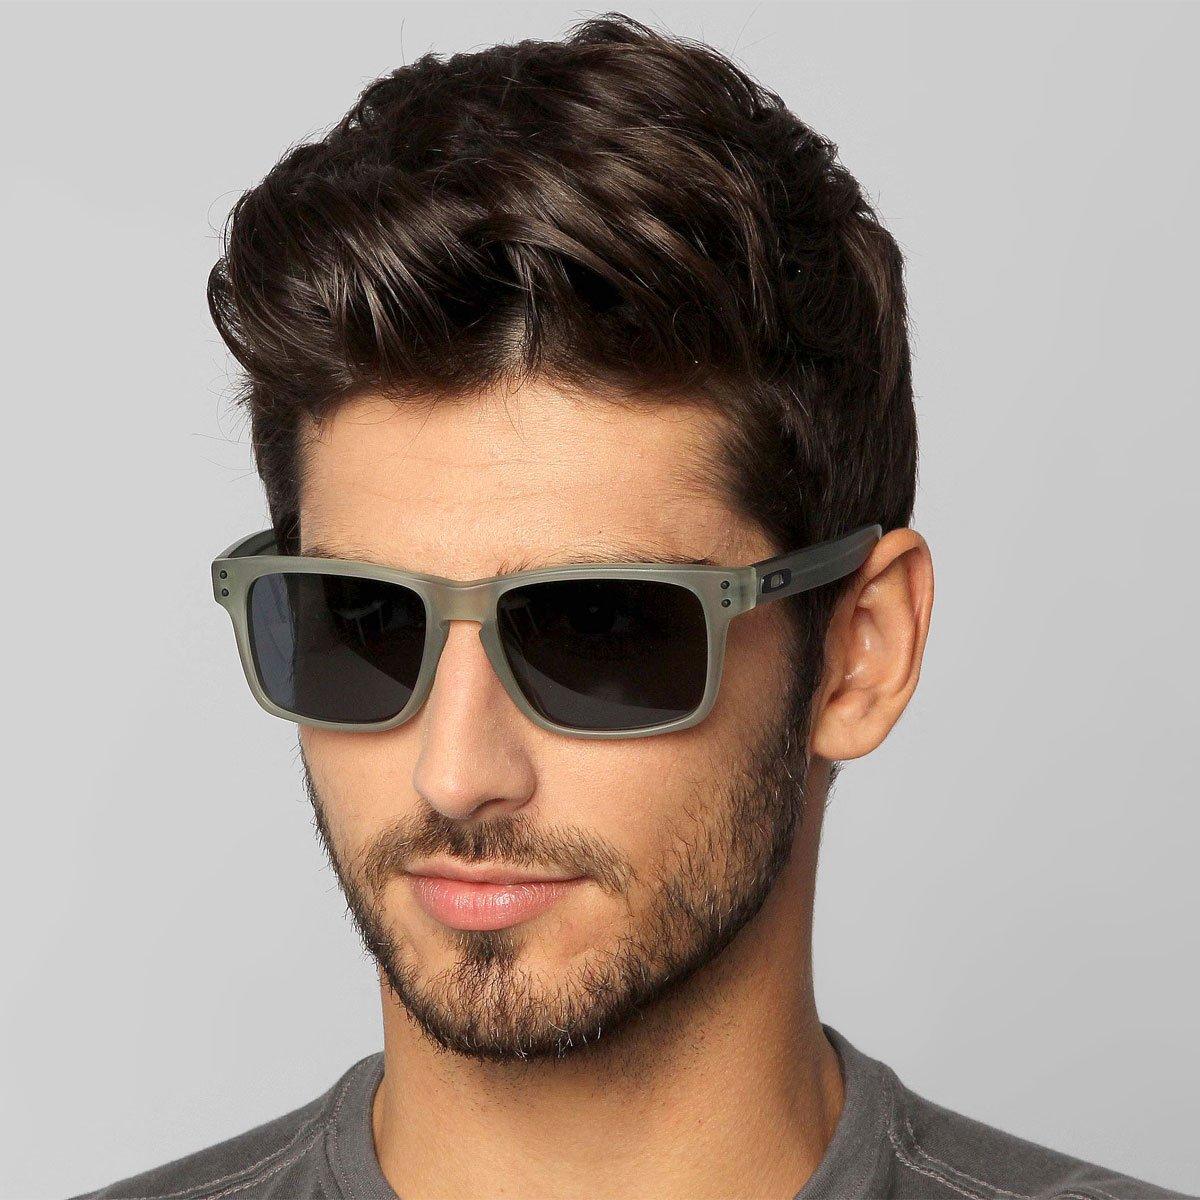 a7850f9117c22 Óculos Oakley Holbrook LX - Compre Agora   Netshoes